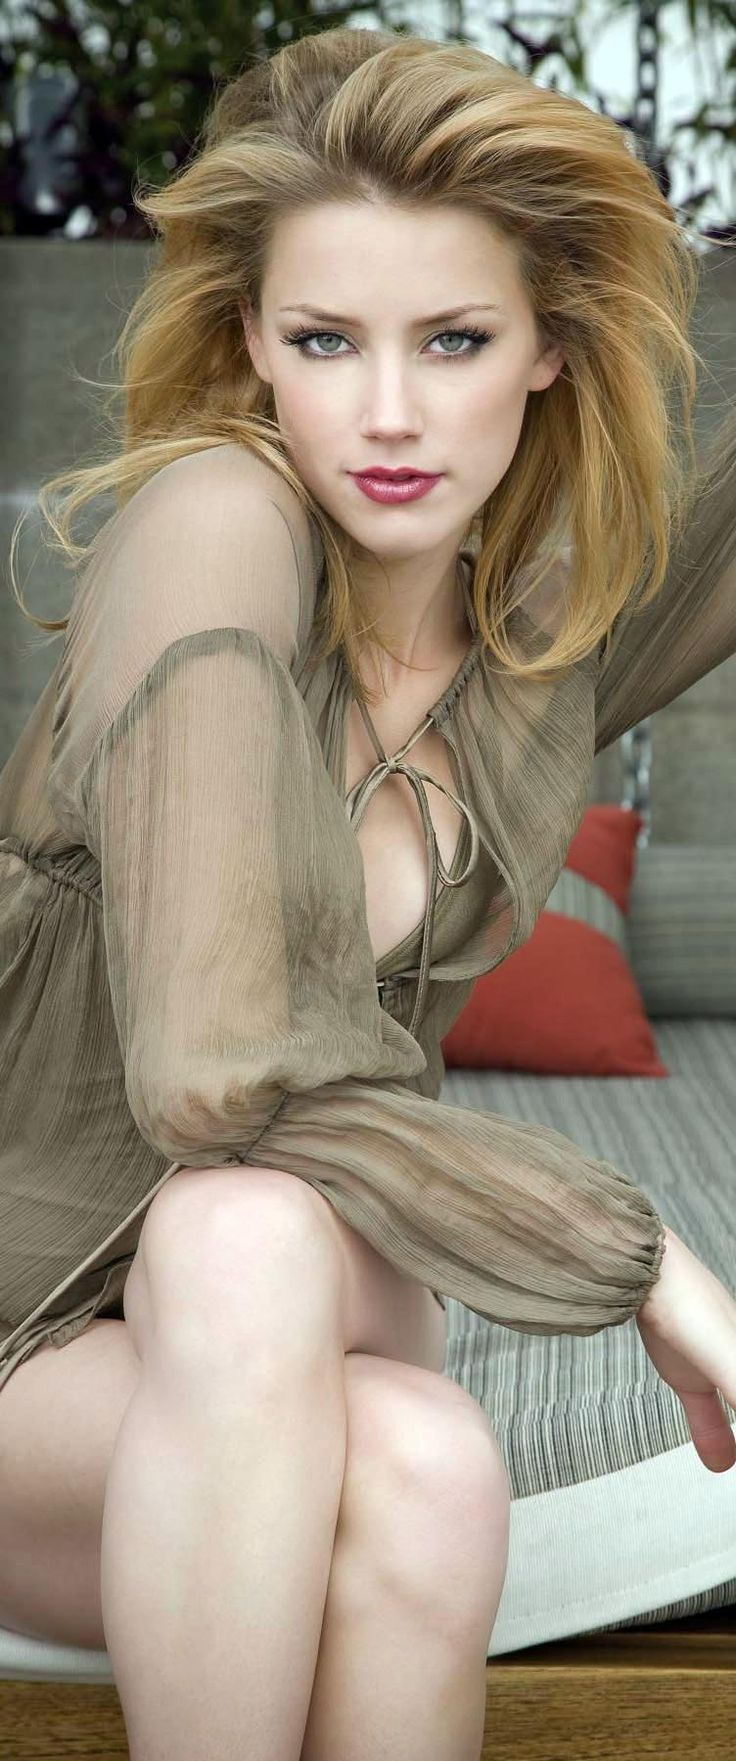 Amber Heard Saturday Night Magazine 2008 from Evynne Labeau s favourites Album